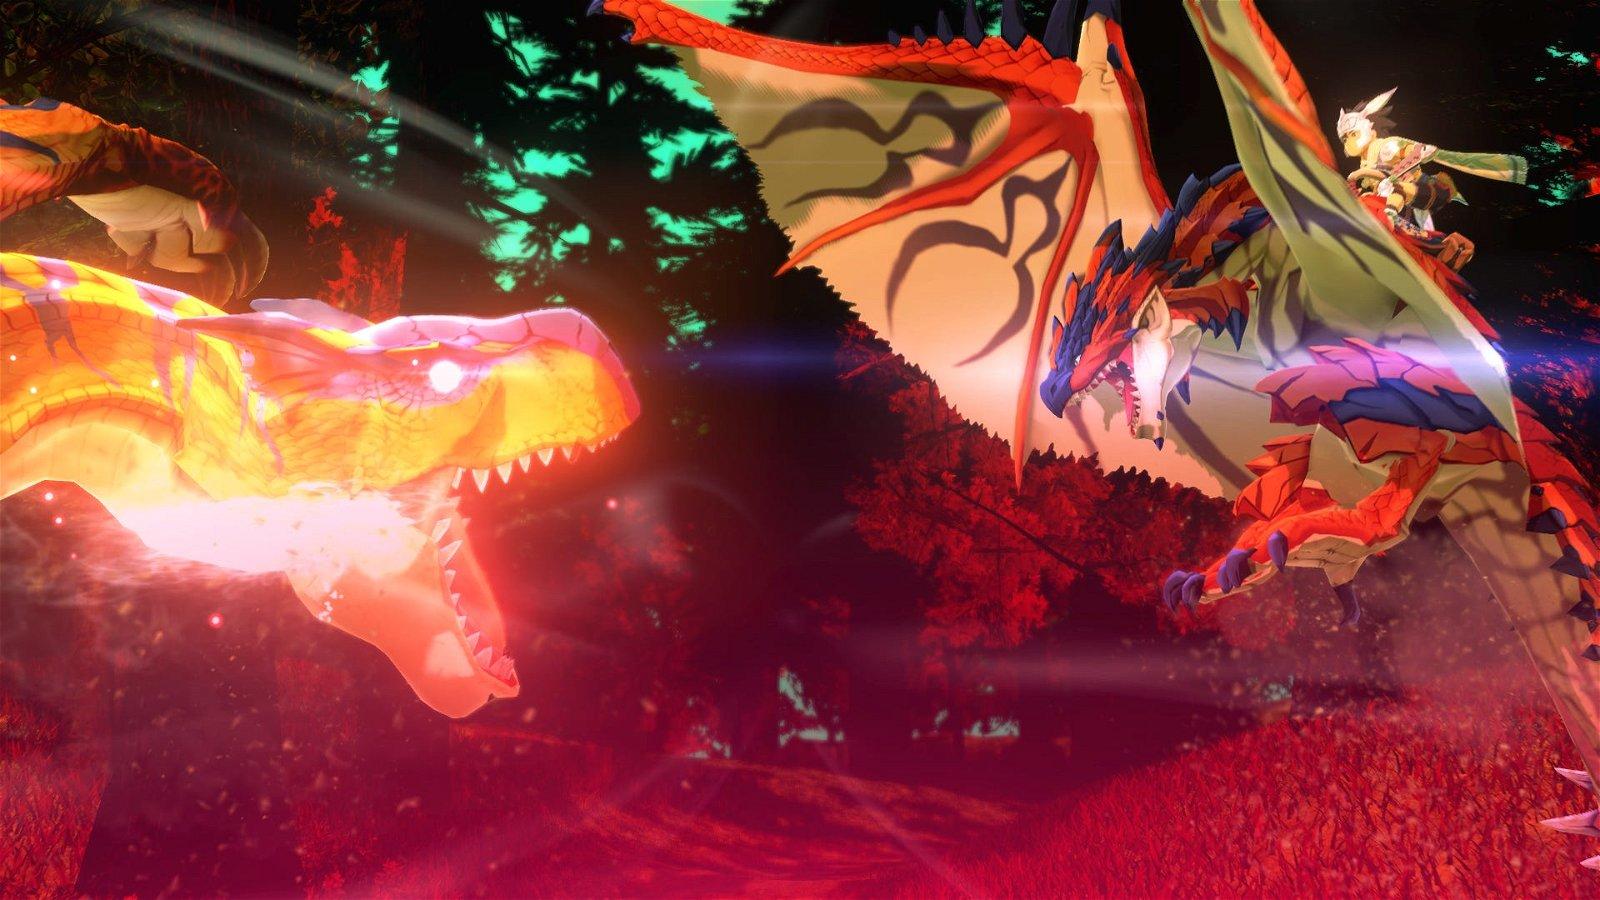 Capcom Announces Monster Hunter Digital Event — Details Collector's Editions